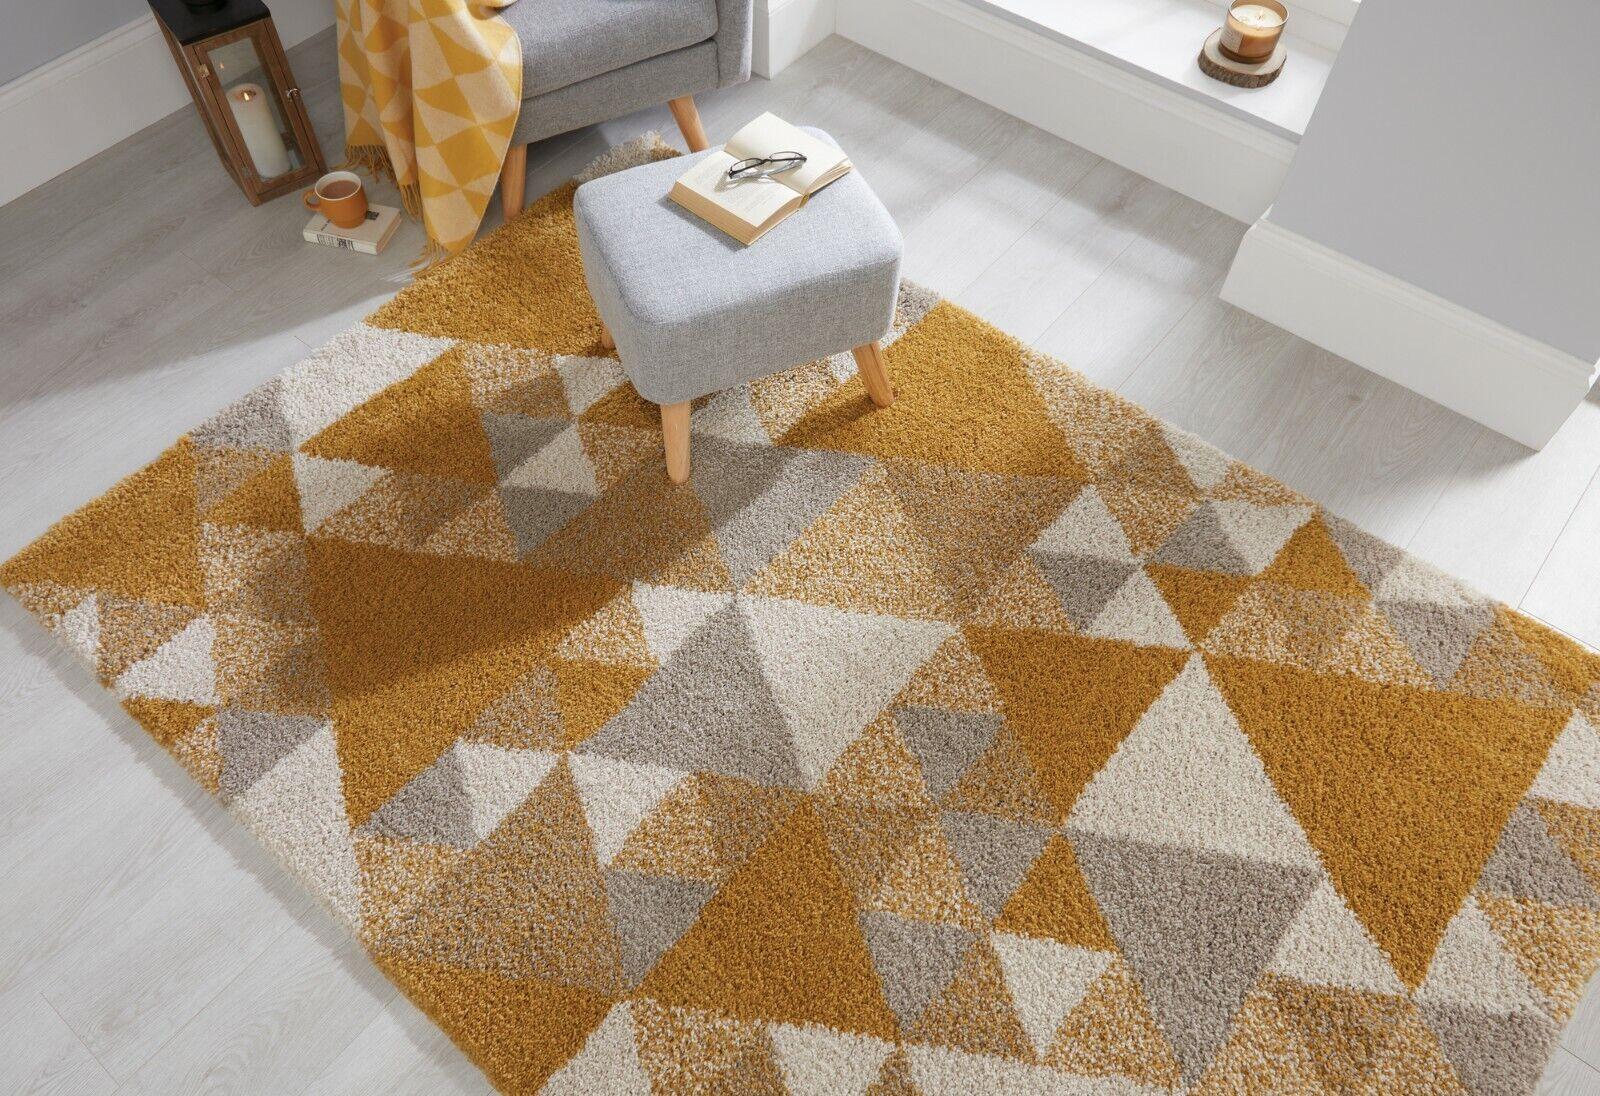 details sur dakari nuru geometrique ocre jaune creme gris poilu petit grand tapis chemin